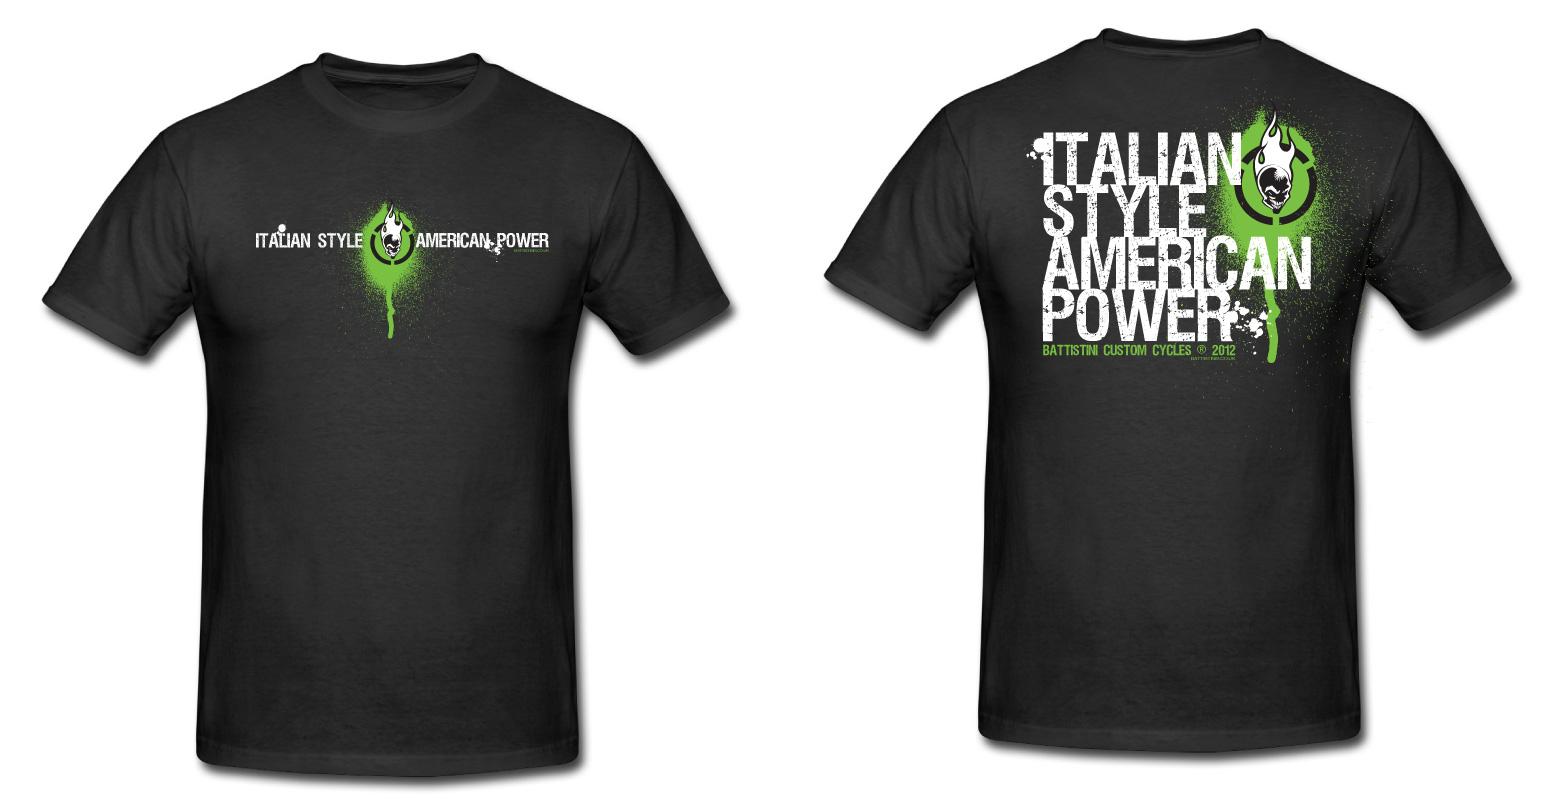 Battistinis custom cycles battistinis brand new t shirt for Designer t shirts brands